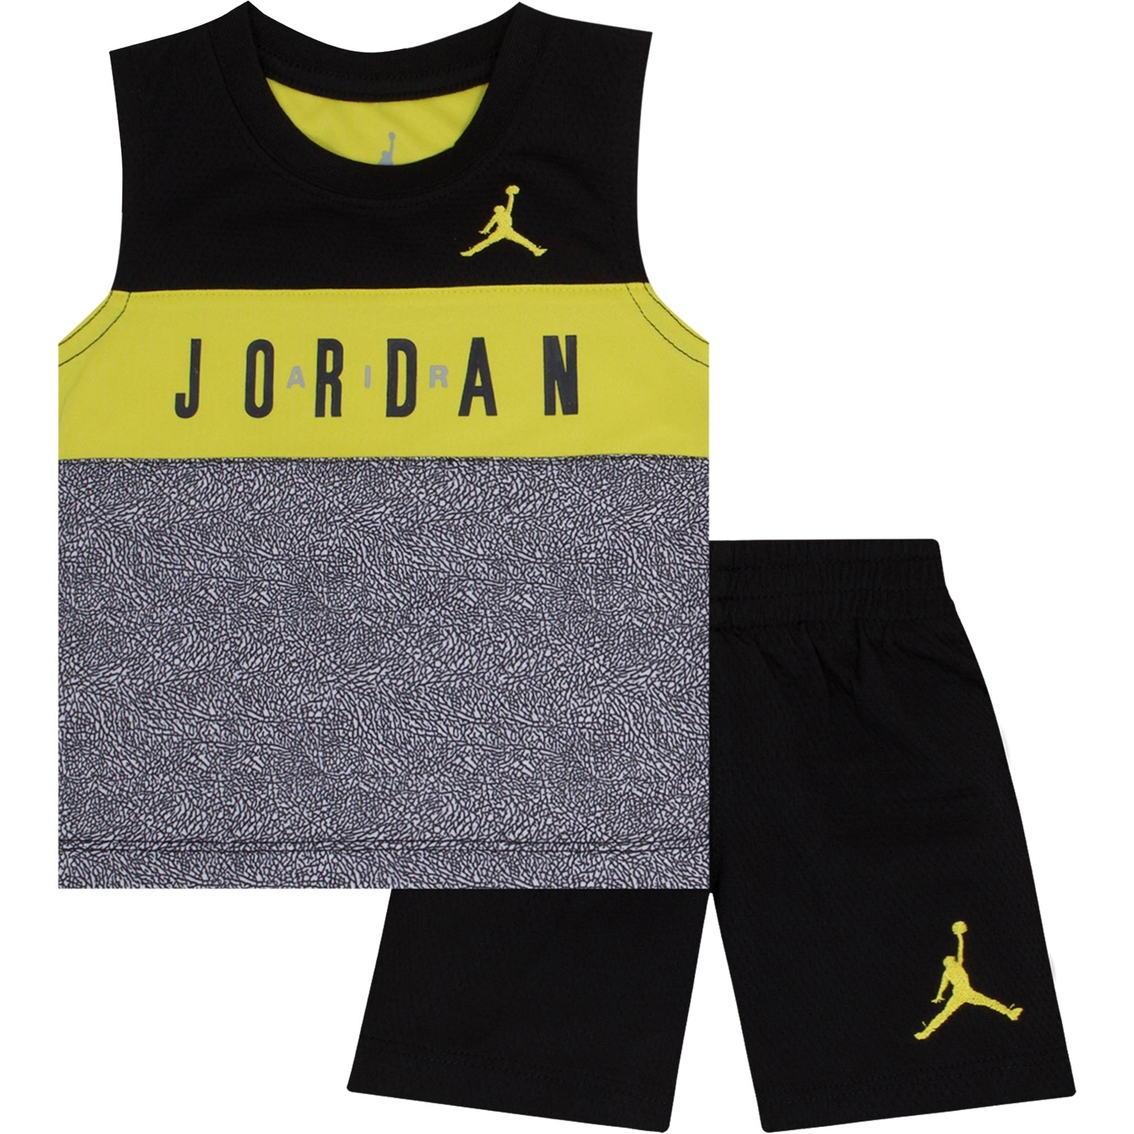 0db1230a0af Jordan Infant Boys 2 Pc. Tricot Tank And Shorts Set   Baby Boy 0-24 ...